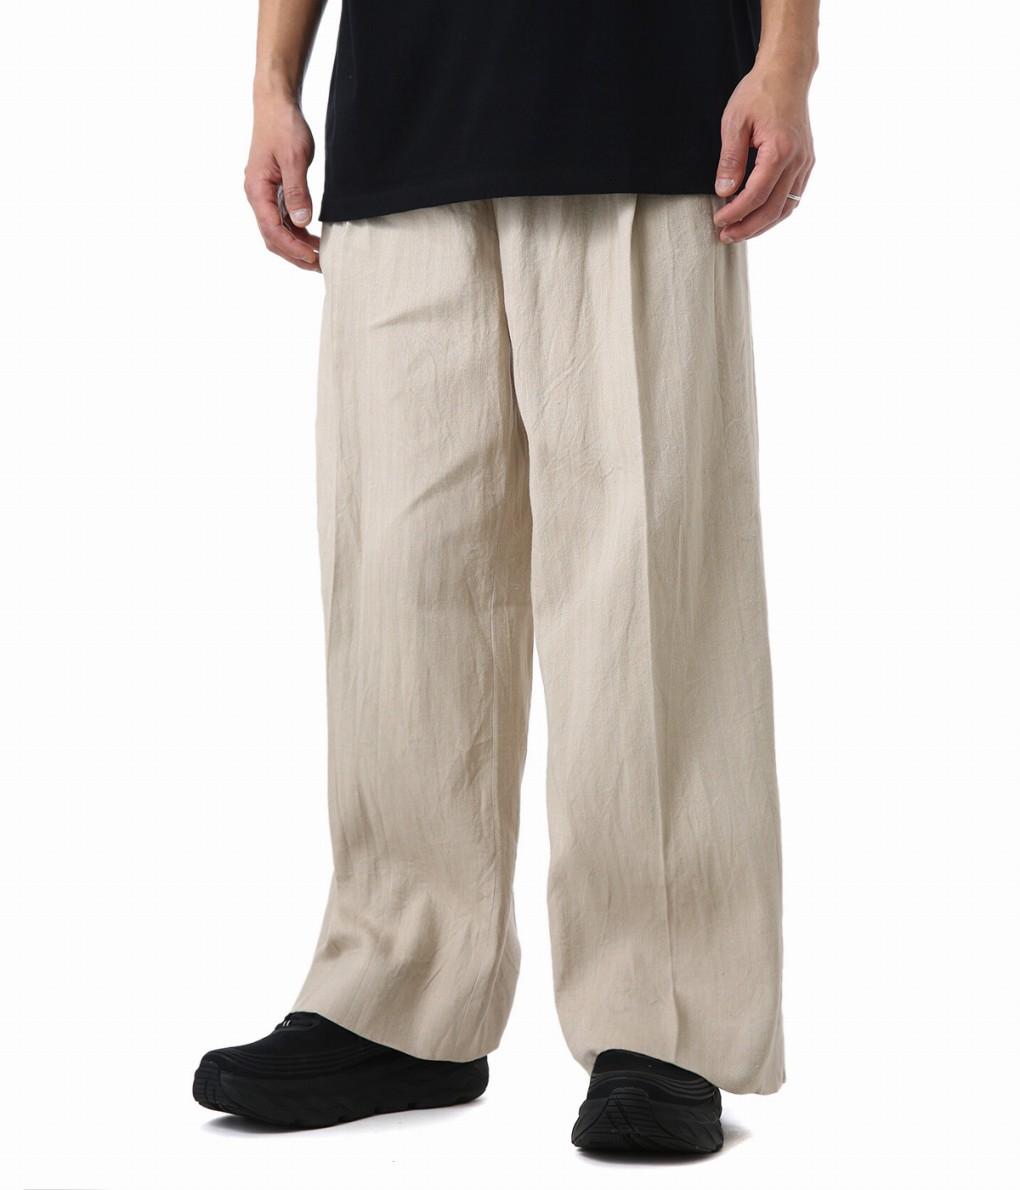 UNUSED / アンユーズド : One pleats wide pants : ワイドパンツ ワークパンツ パンツ メンズ : UW0746 【NOA】